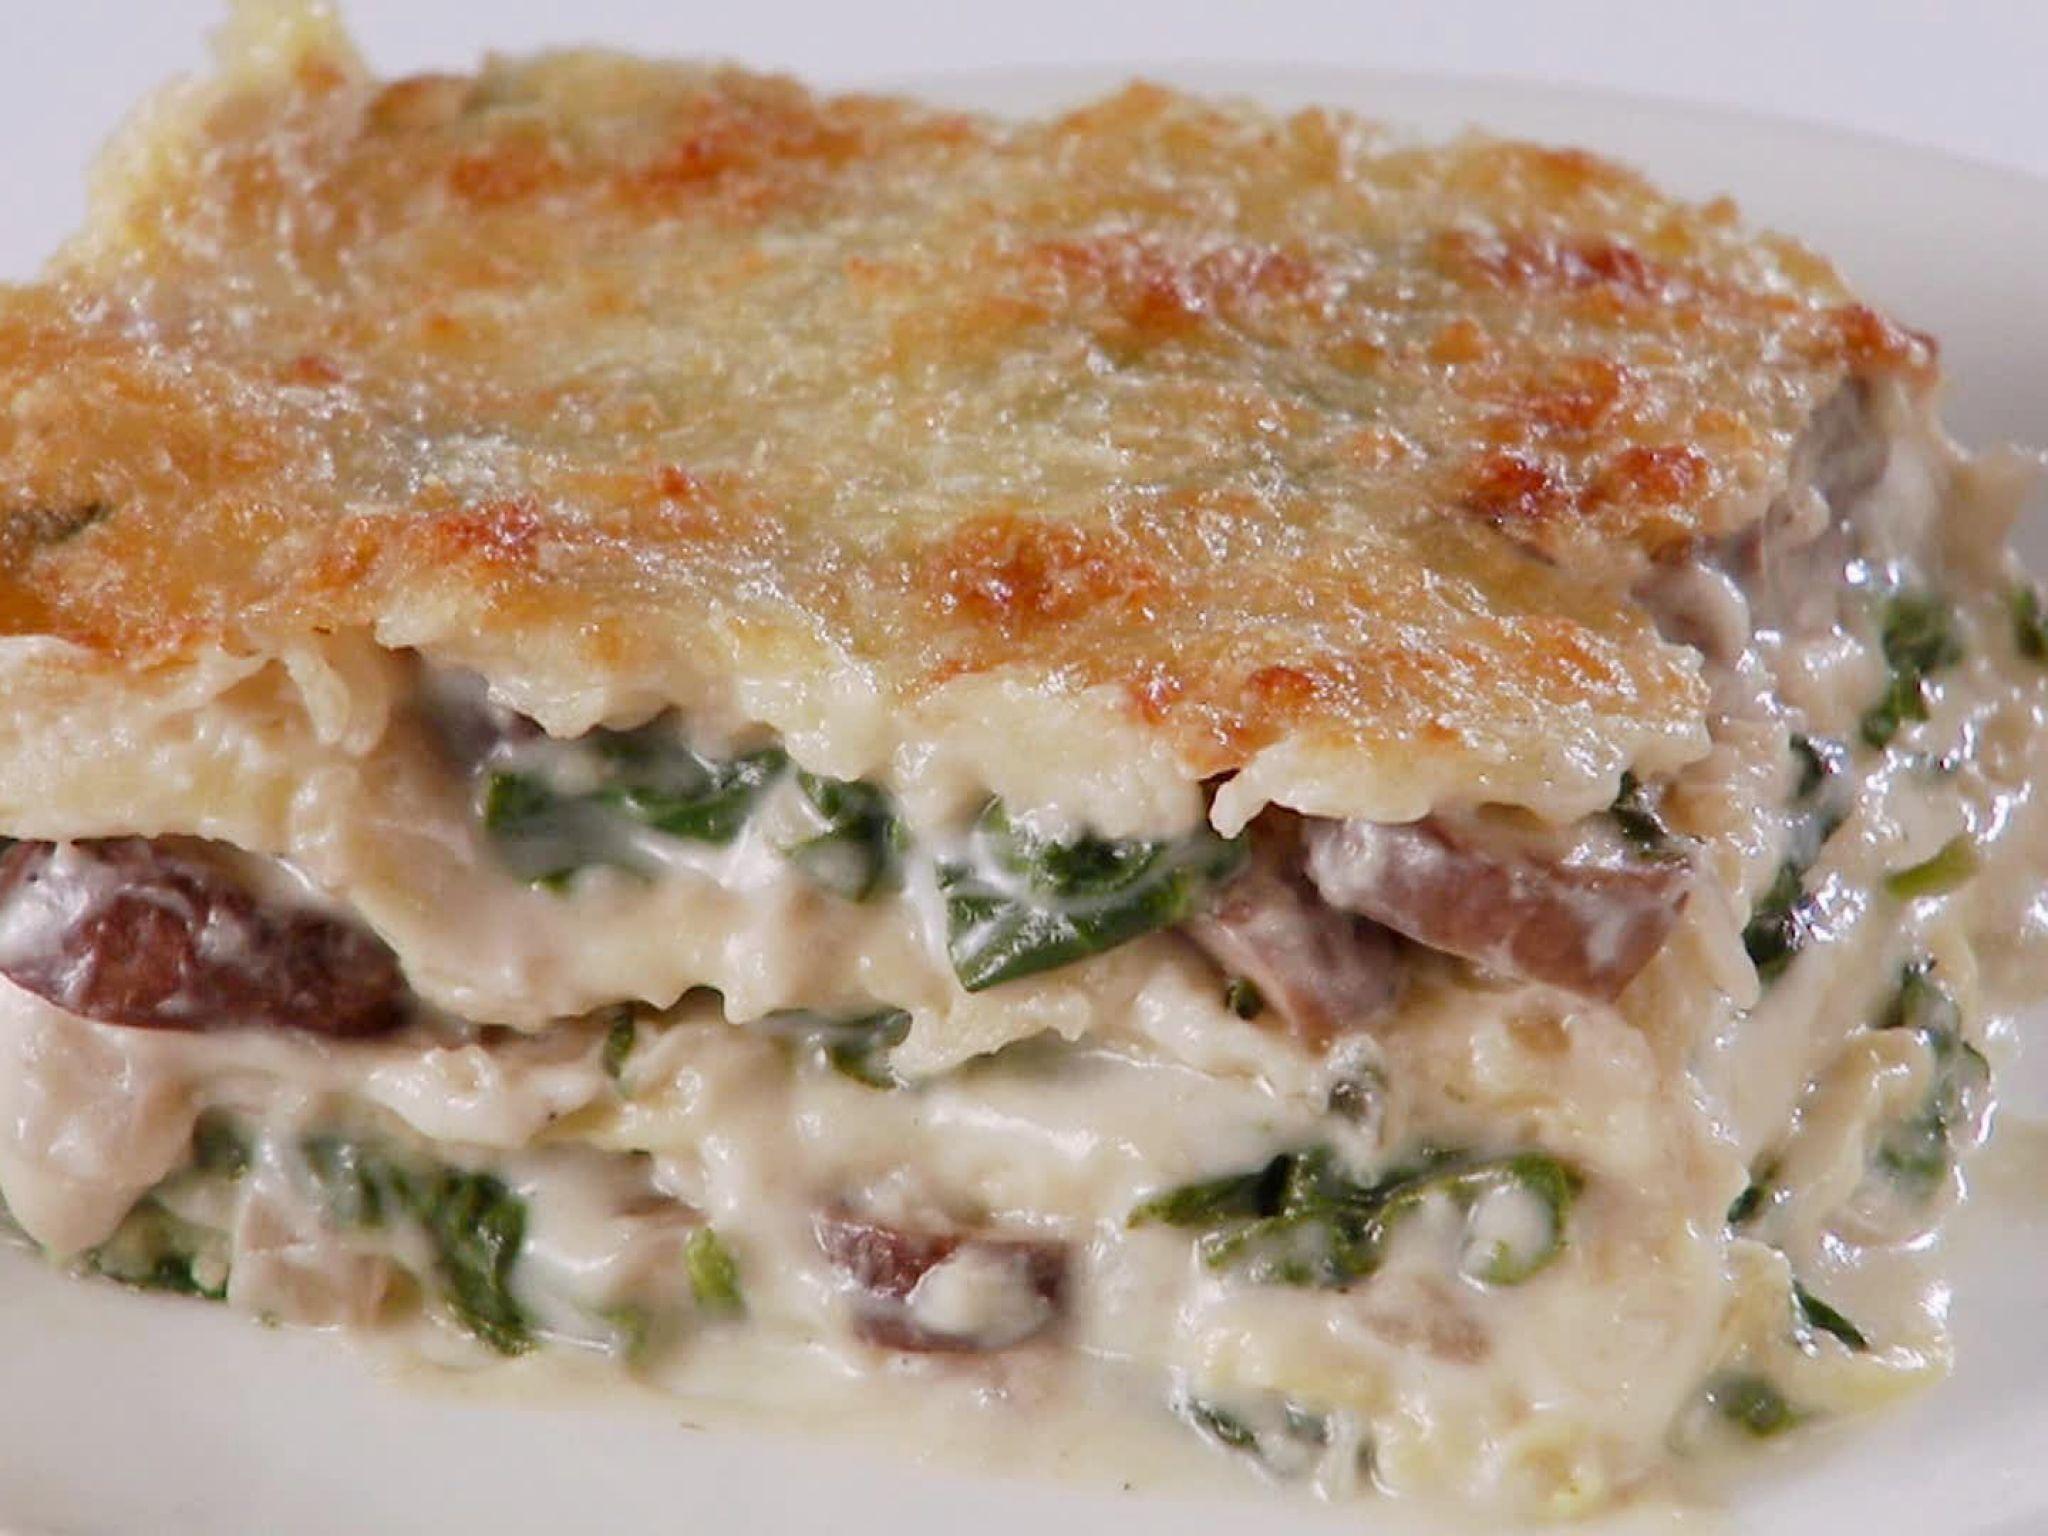 Spinach and Mushroom Lasagna | Recipe | Giada de laurentiis, Spinach ...